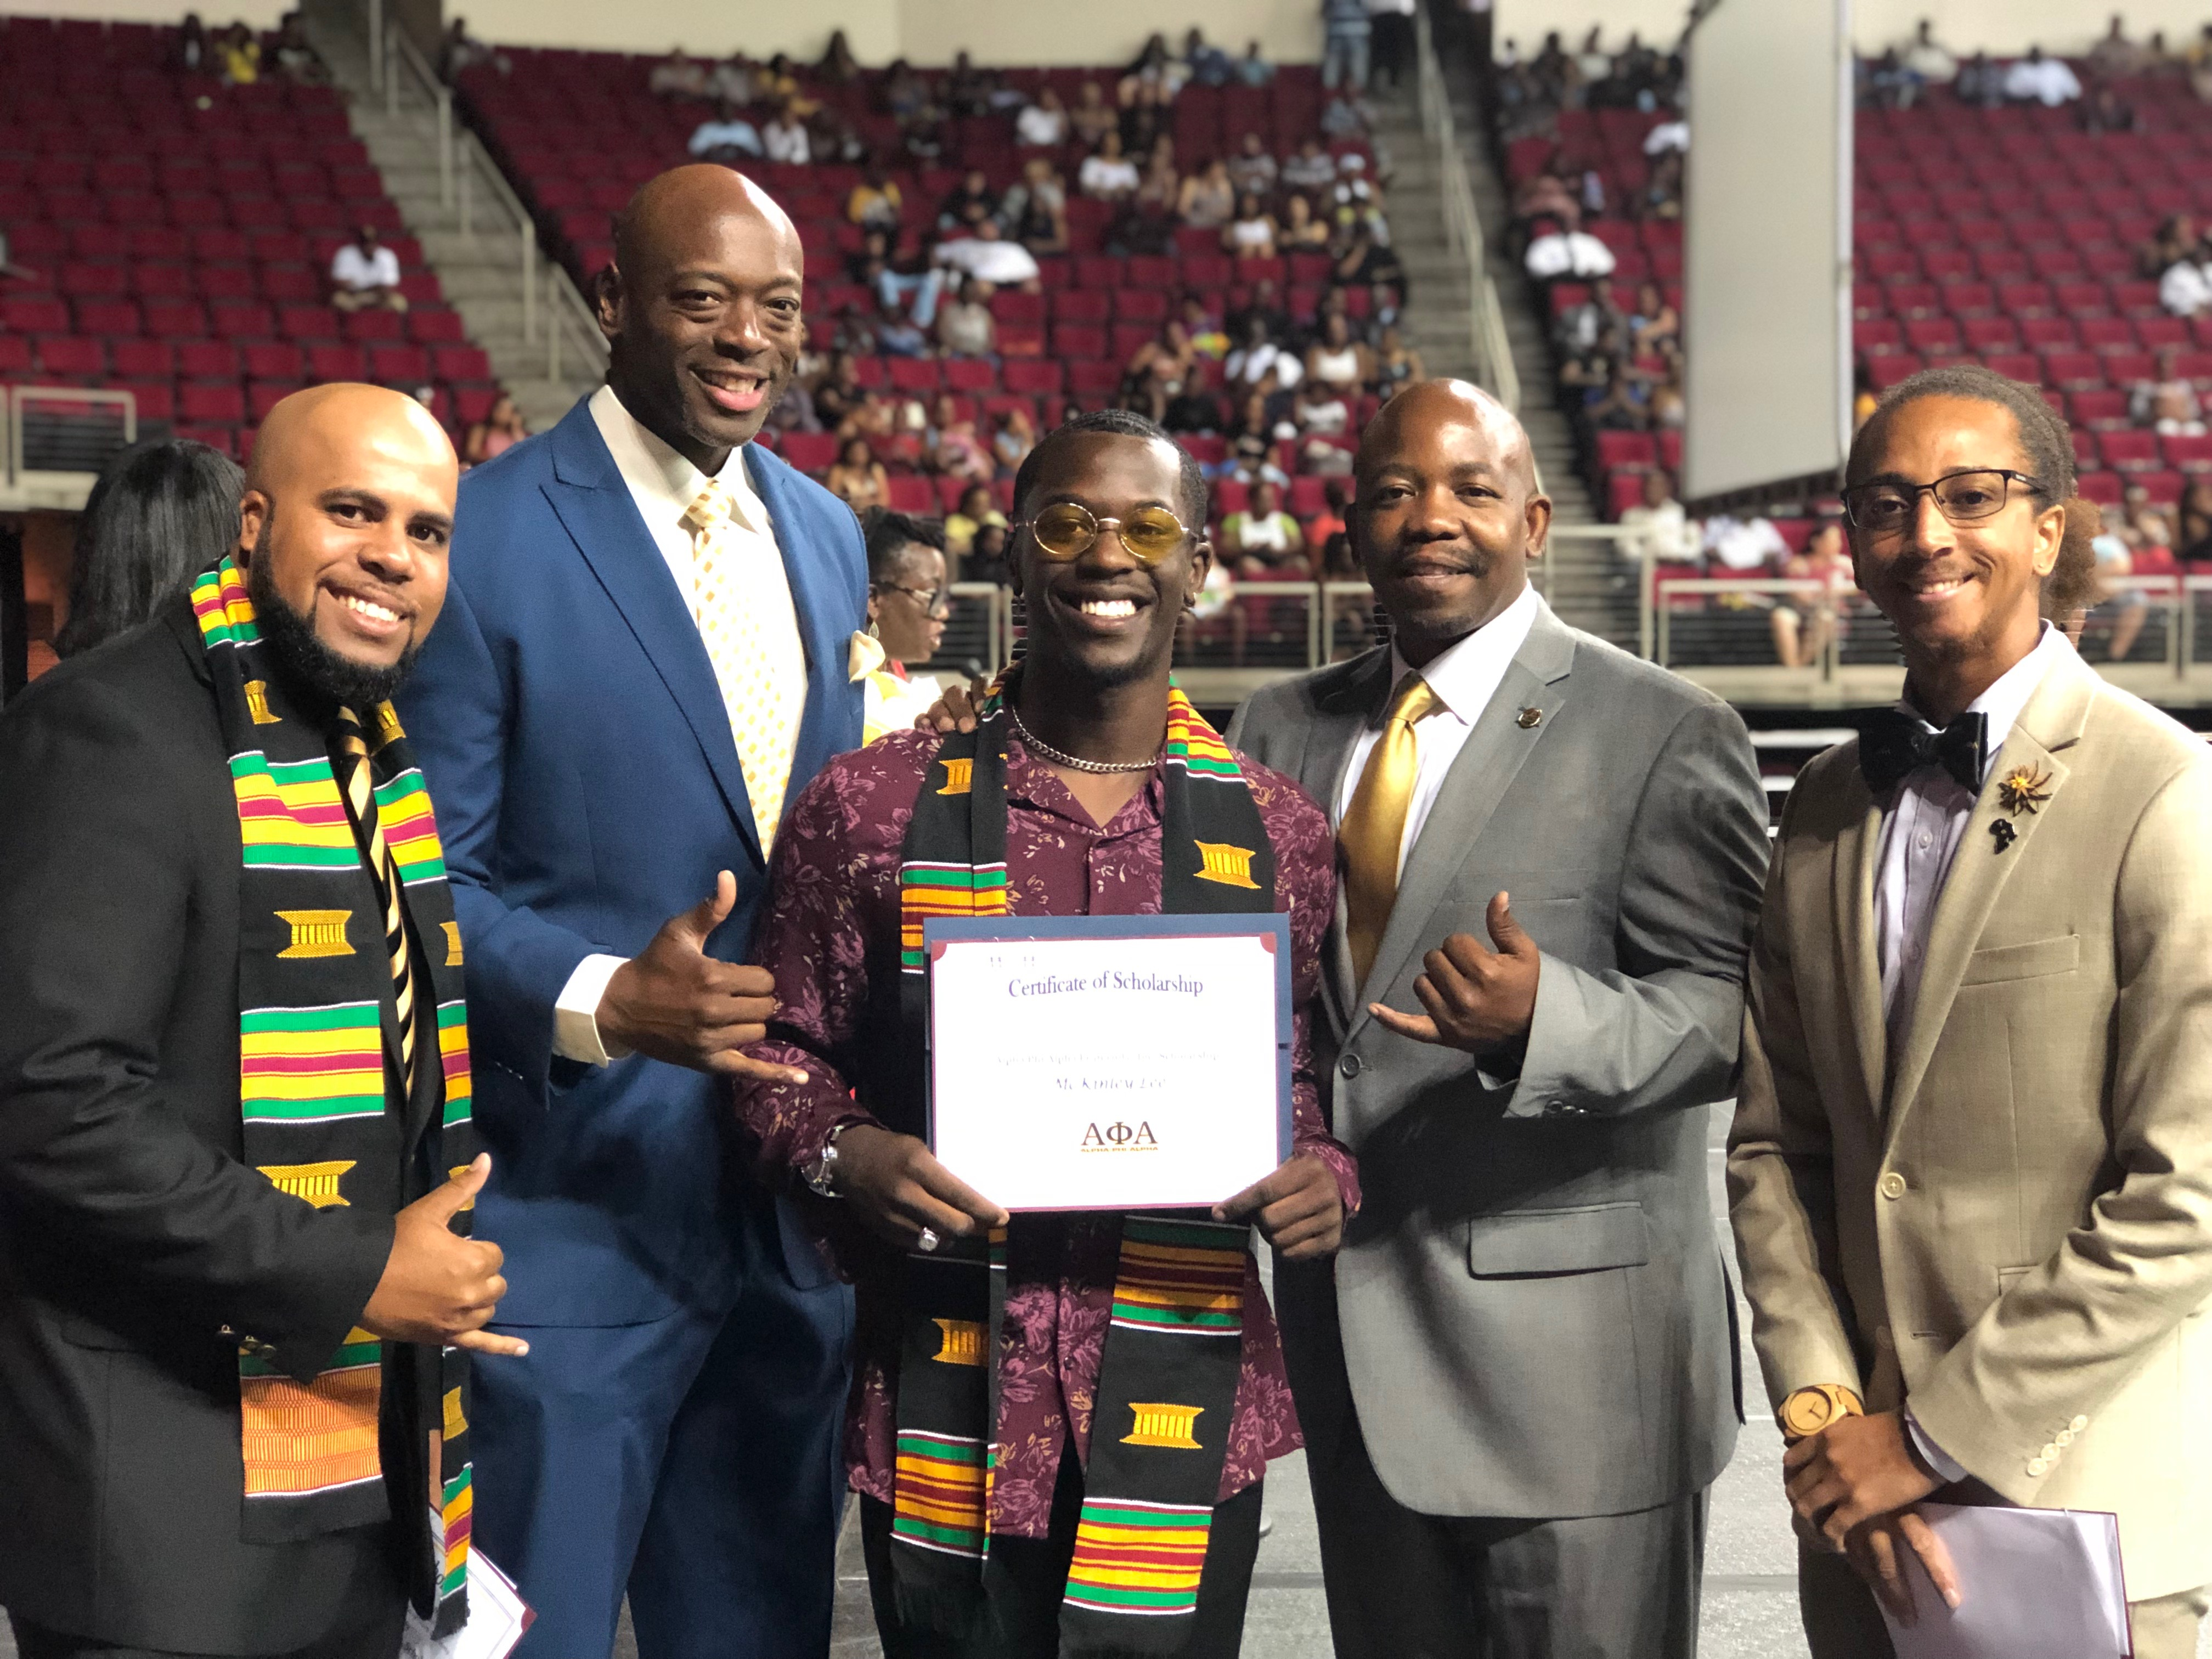 27th African American High School Ceremony Celebration